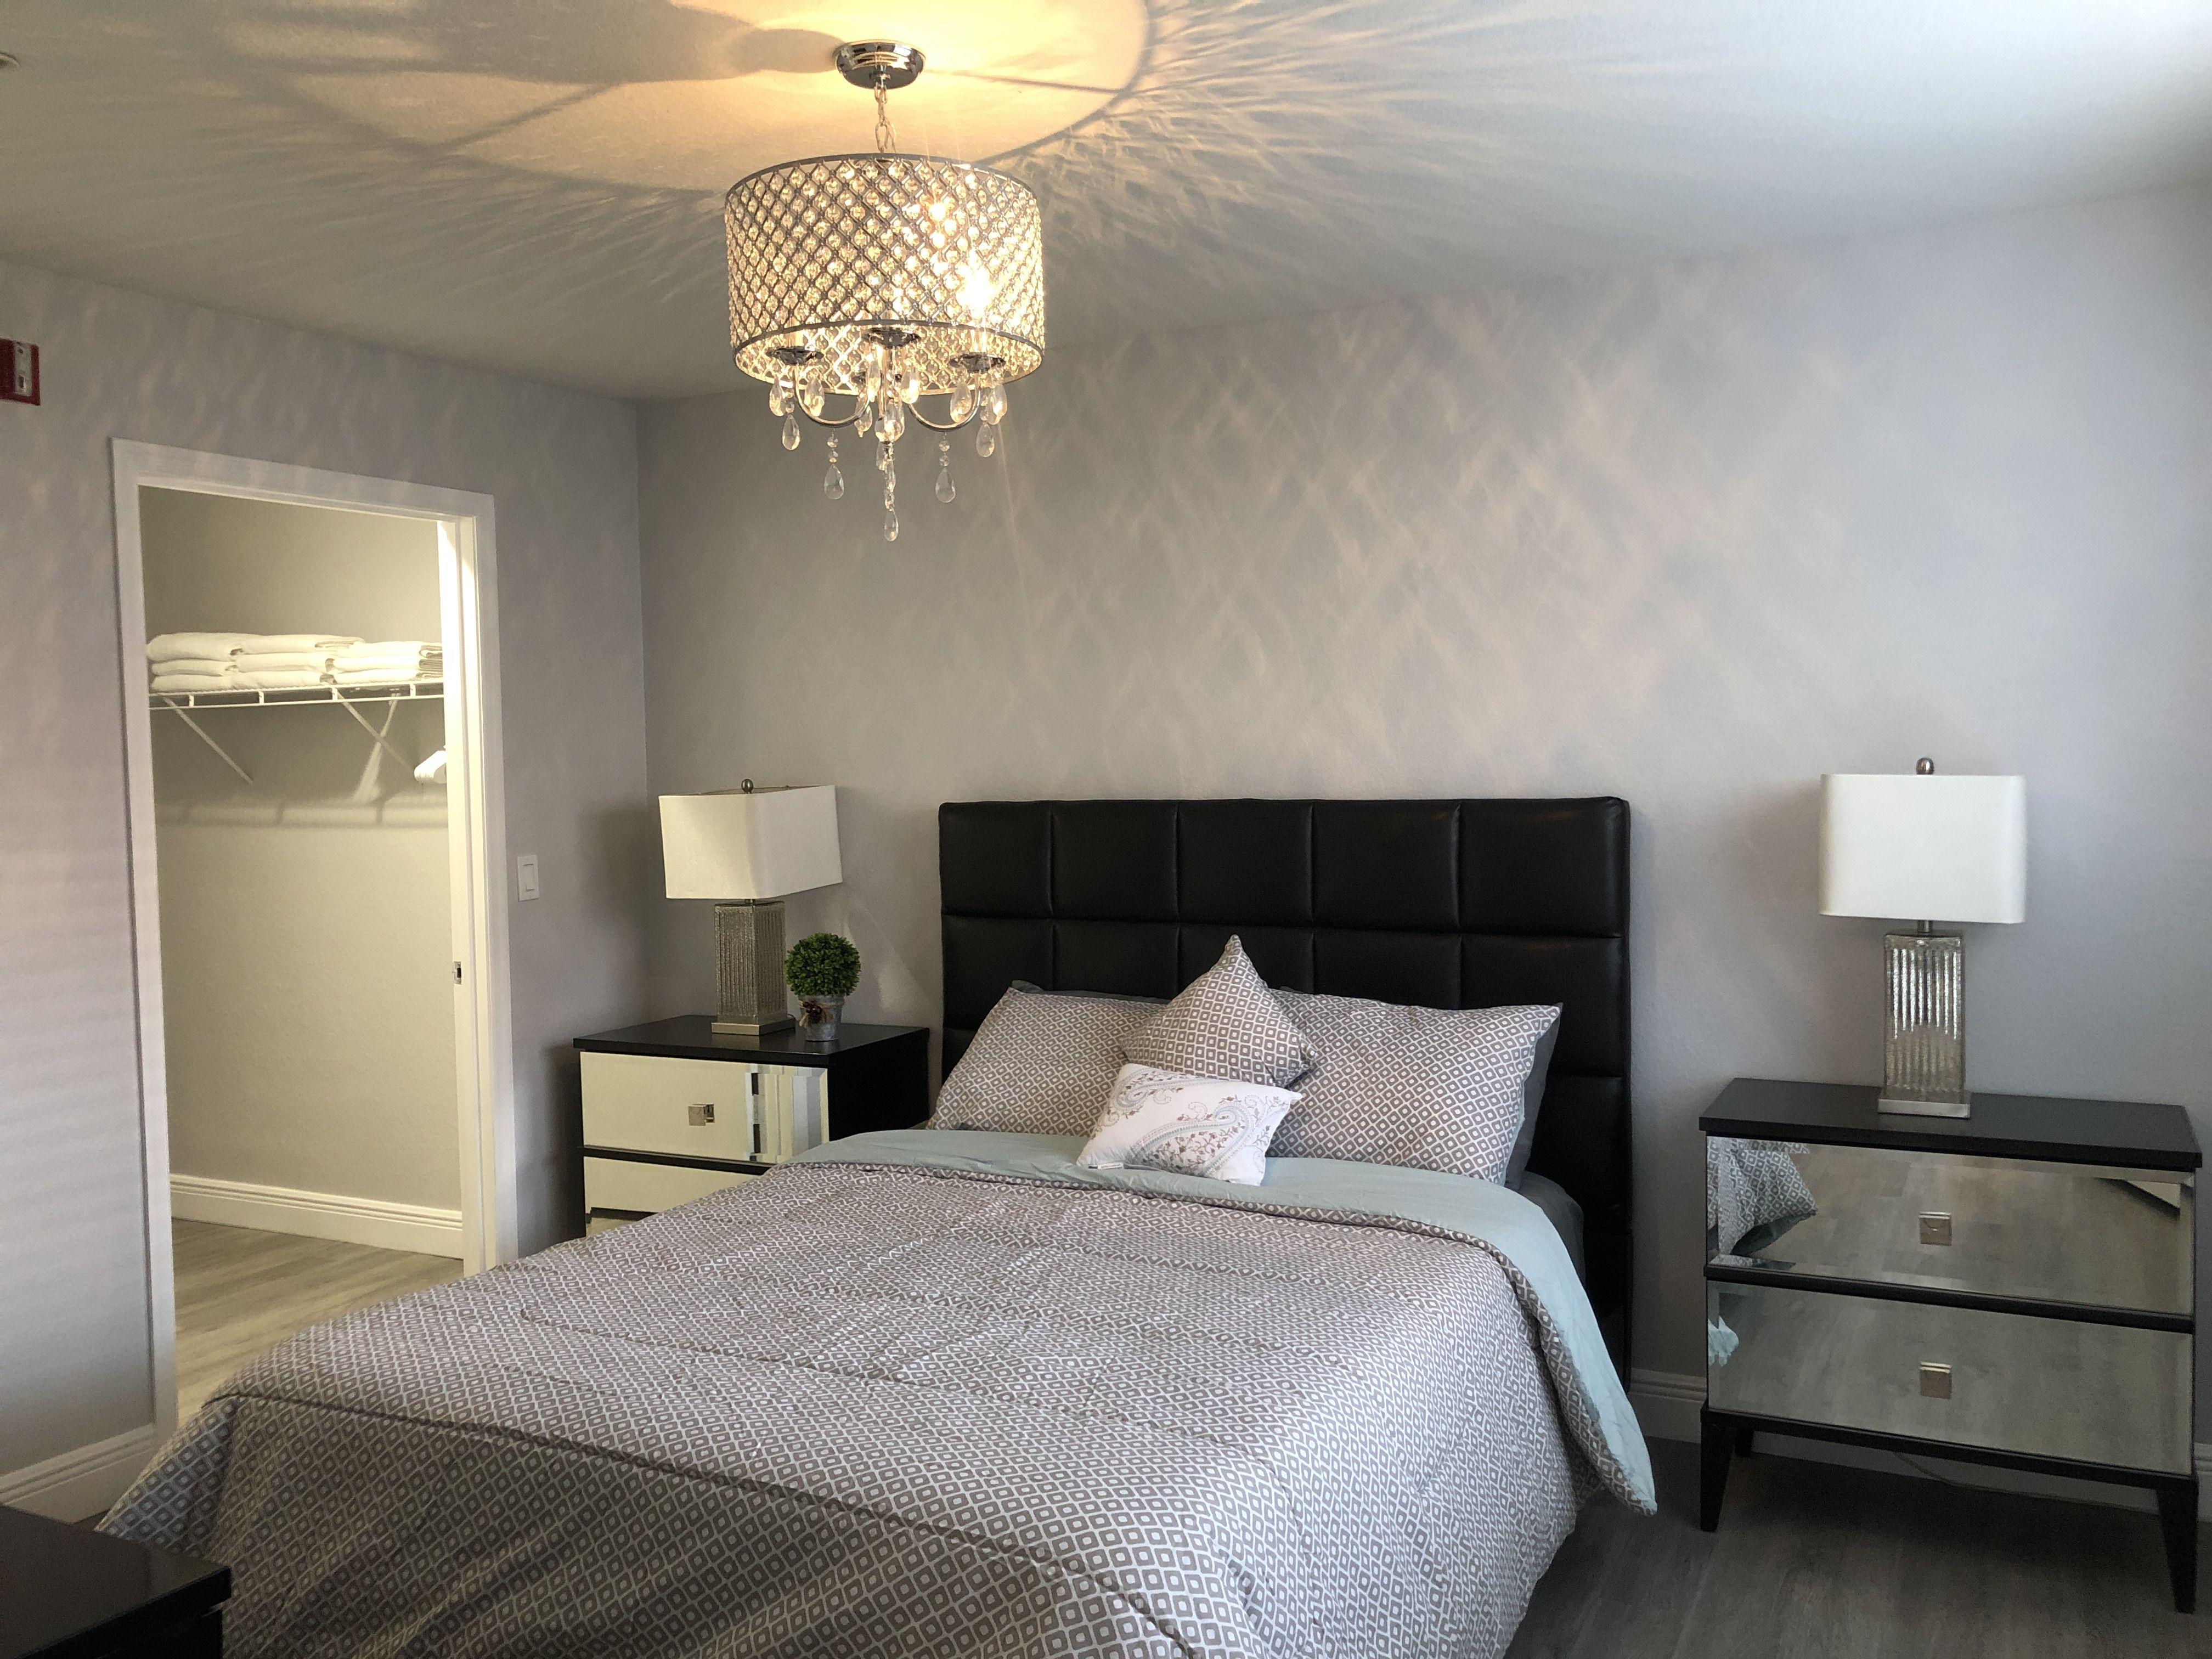 1 bedroom condo located in Metrowest. This resortlike